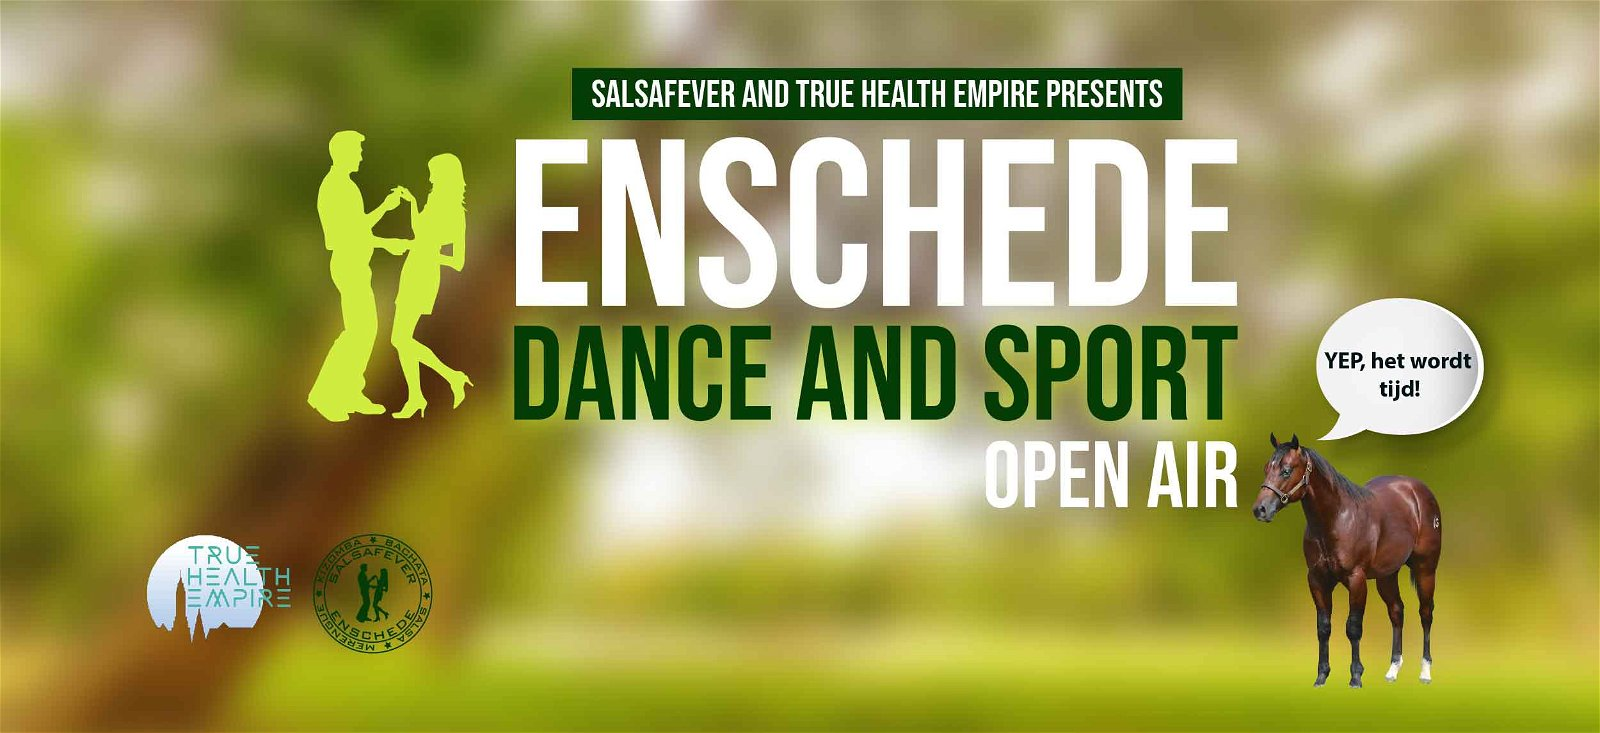 Enschede dance and sport open air met salsafever web official-01